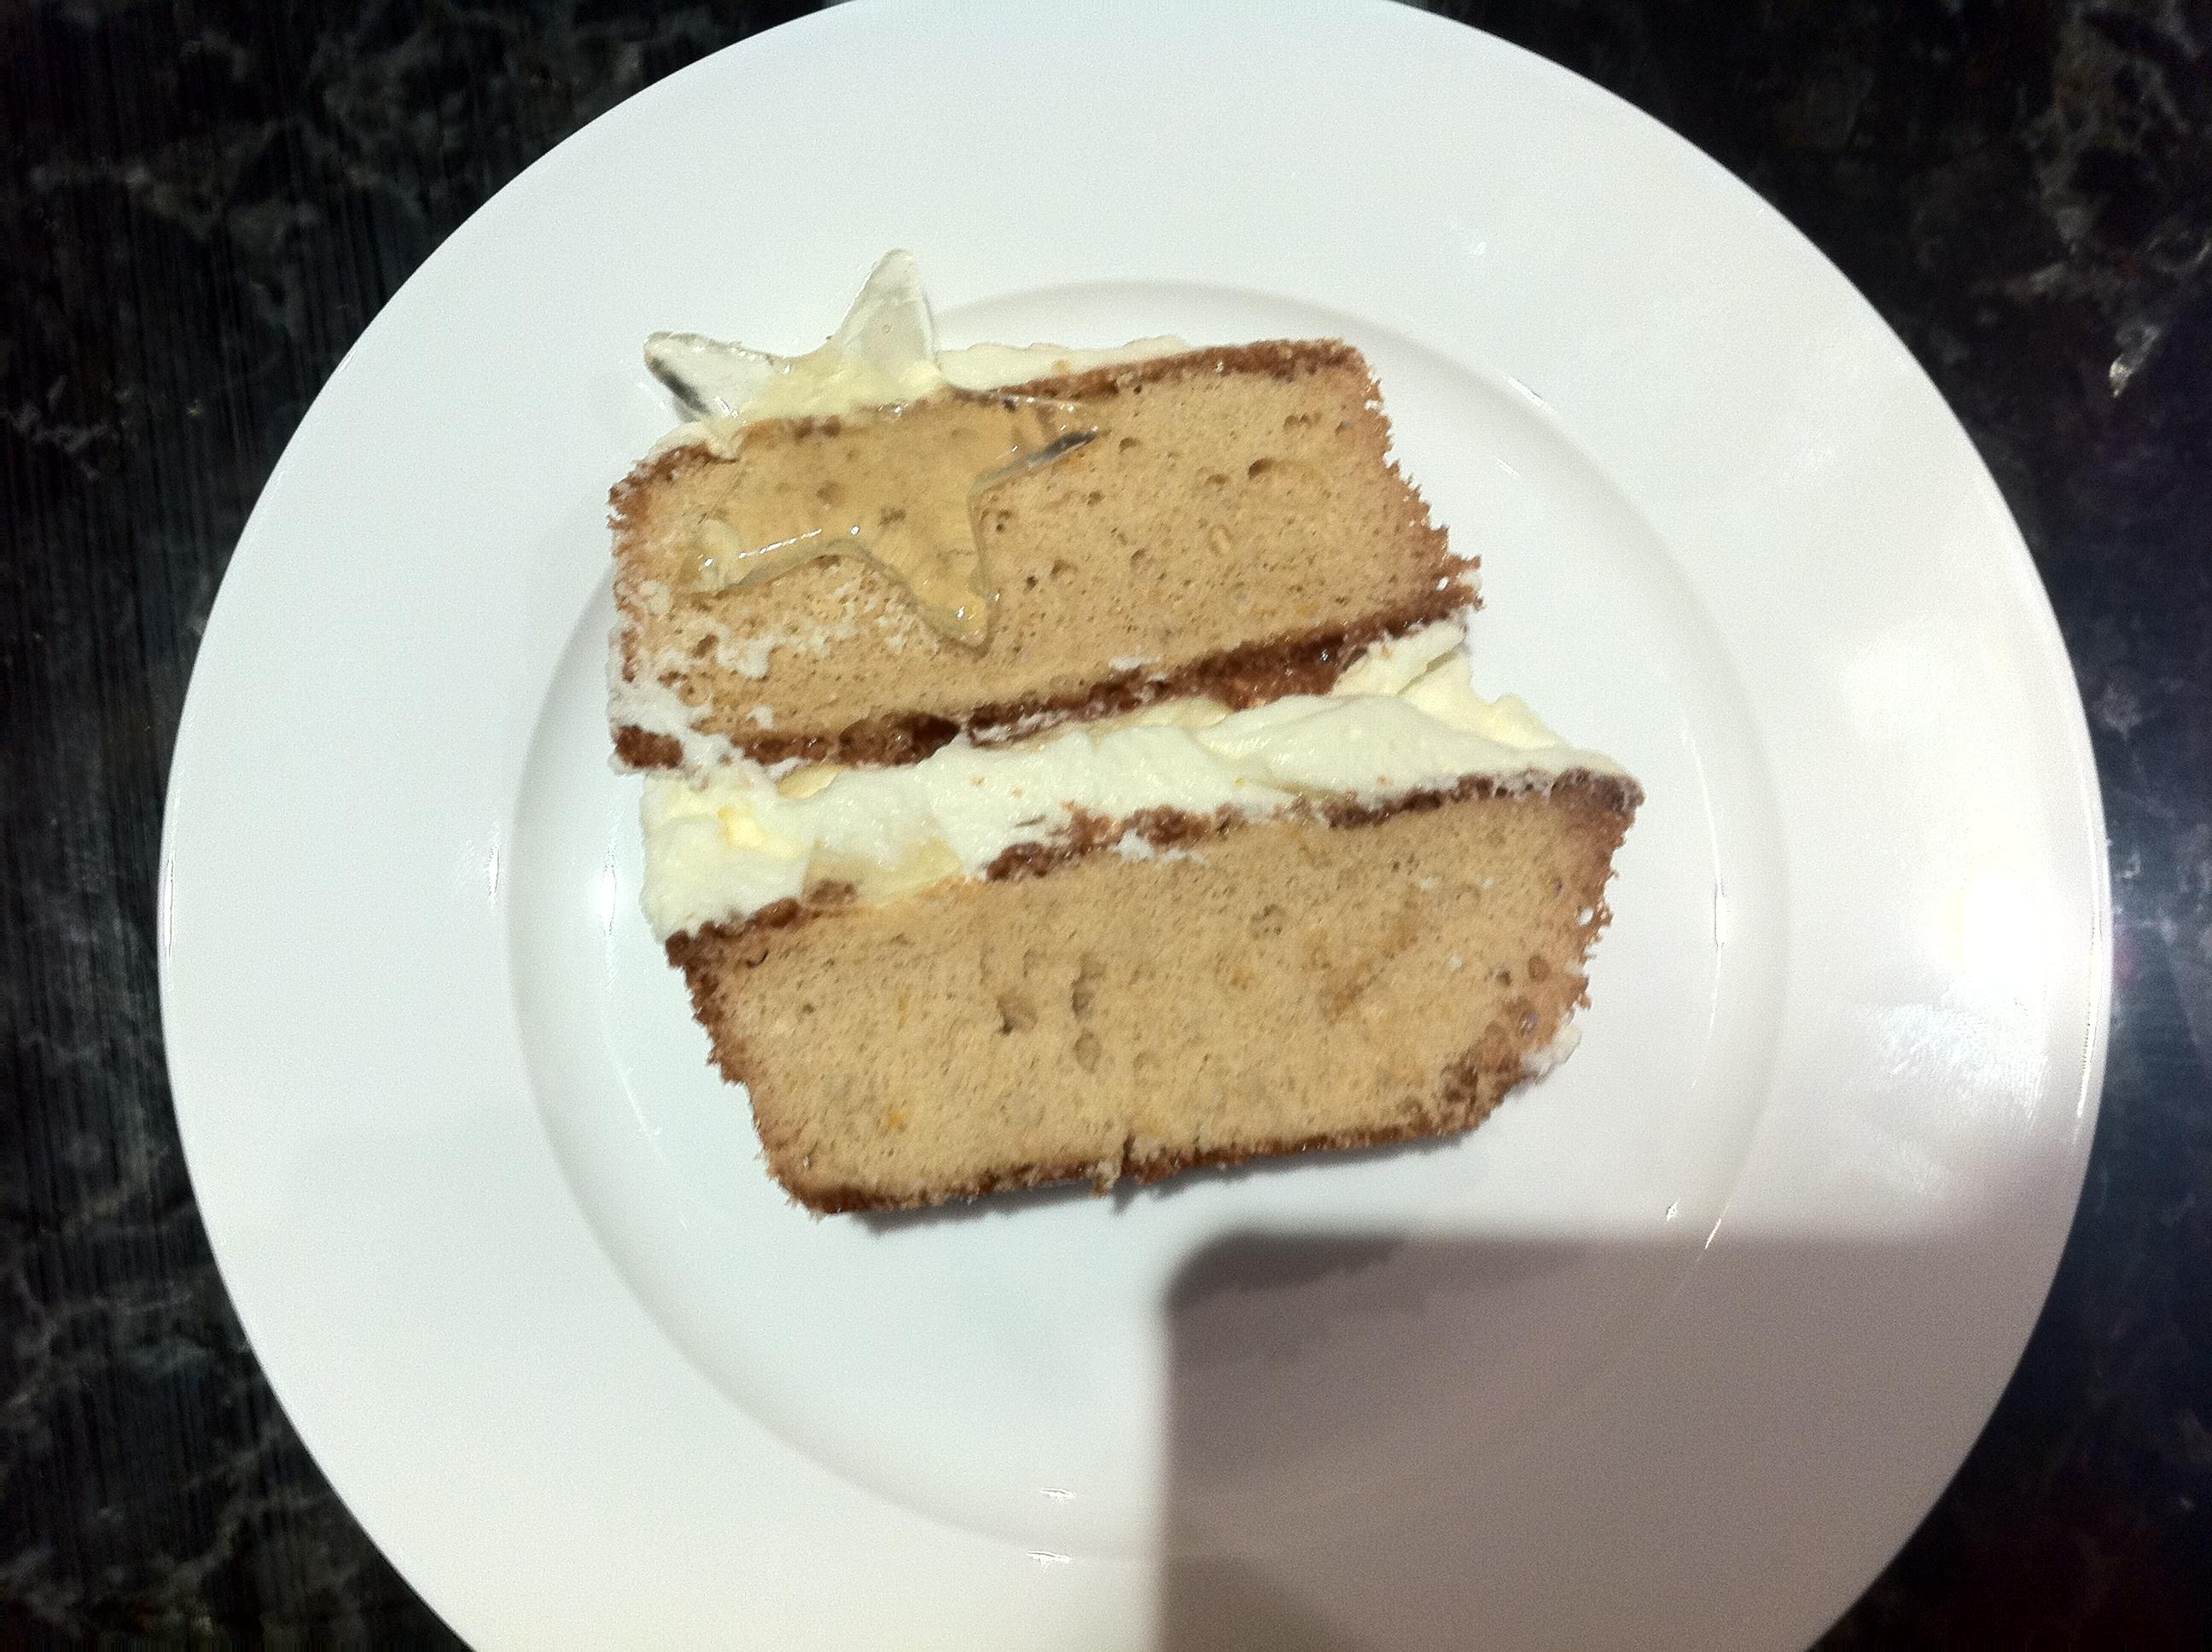 Toffee Shards Cake Decorating